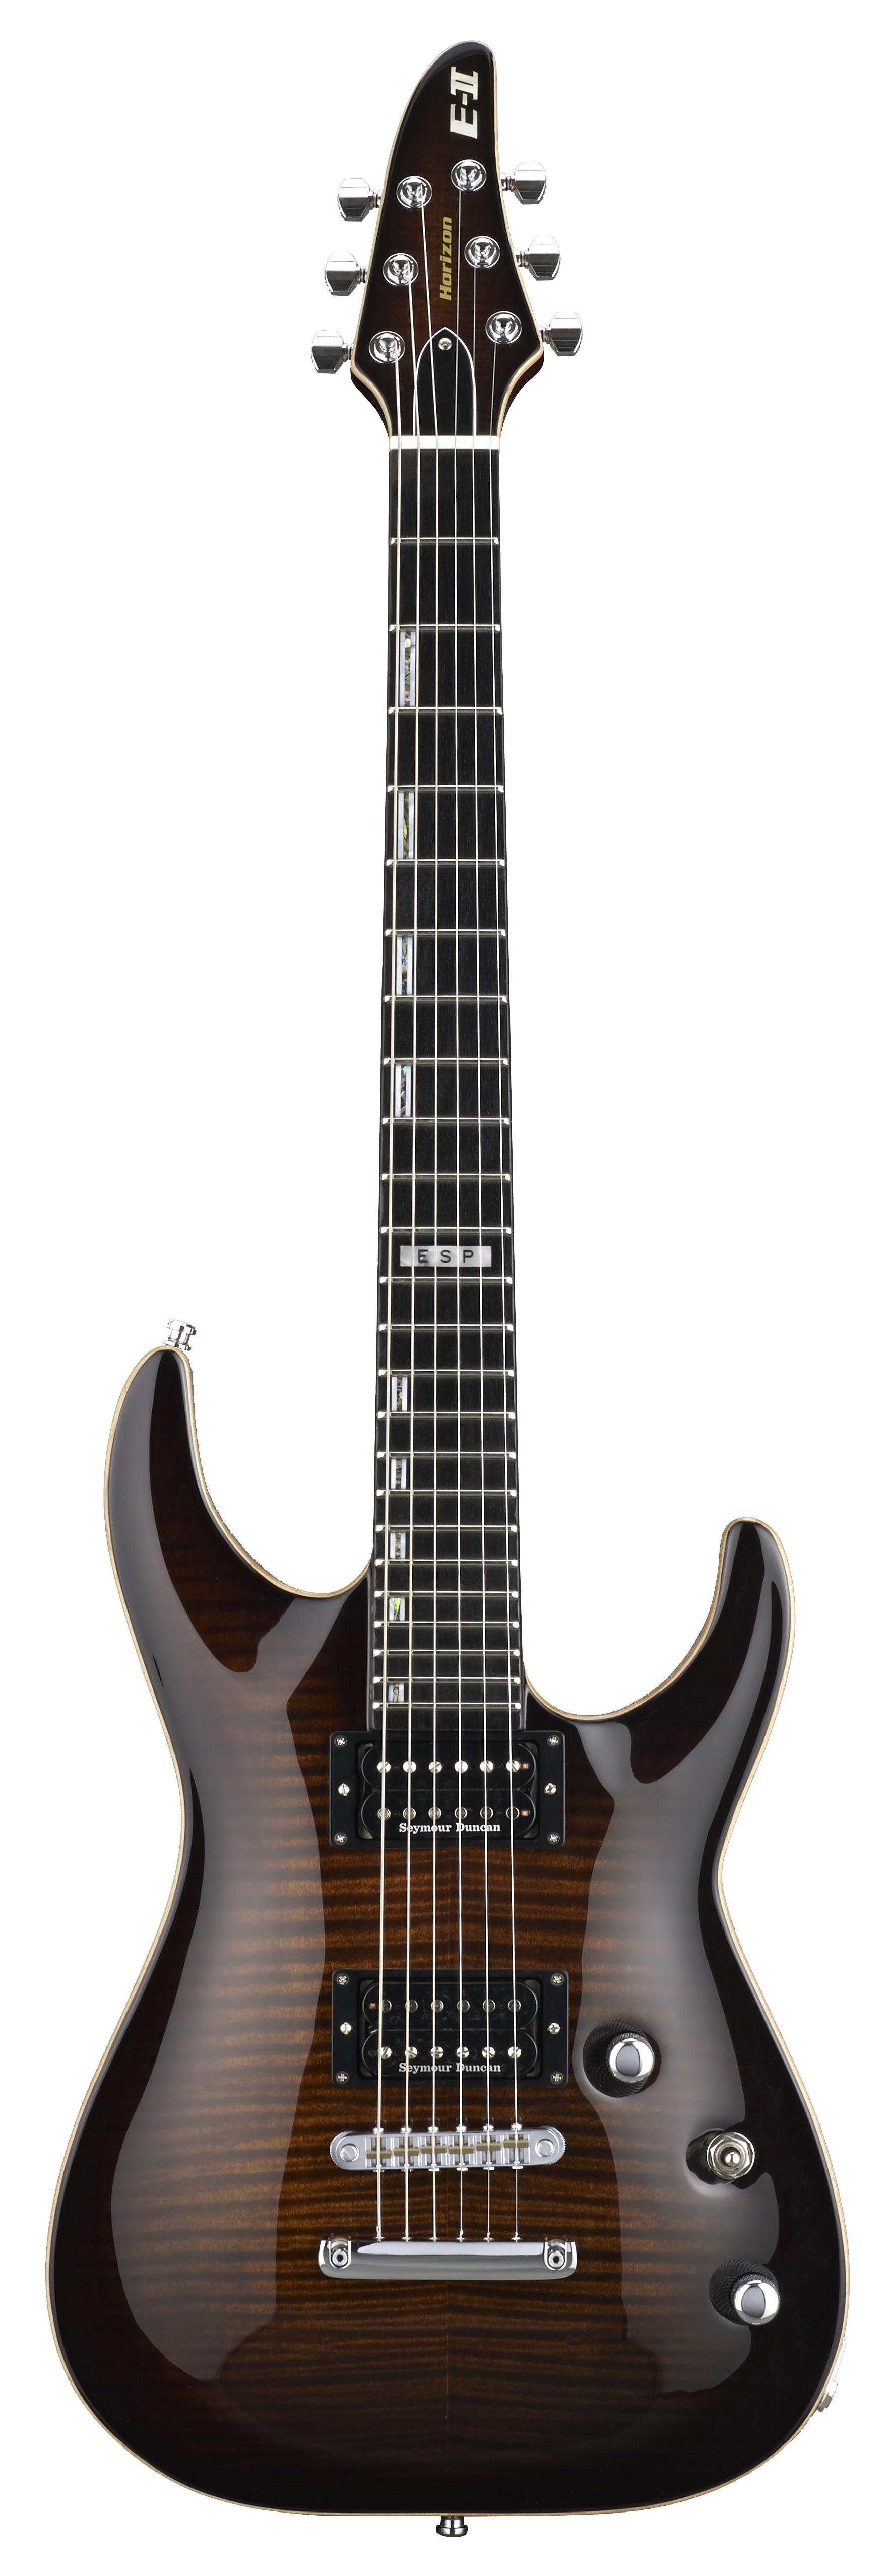 ESP HORIZON FM NT DBSB E-II FM/NT Electric Guitar with Case and Dark Brown Sunburst Finish